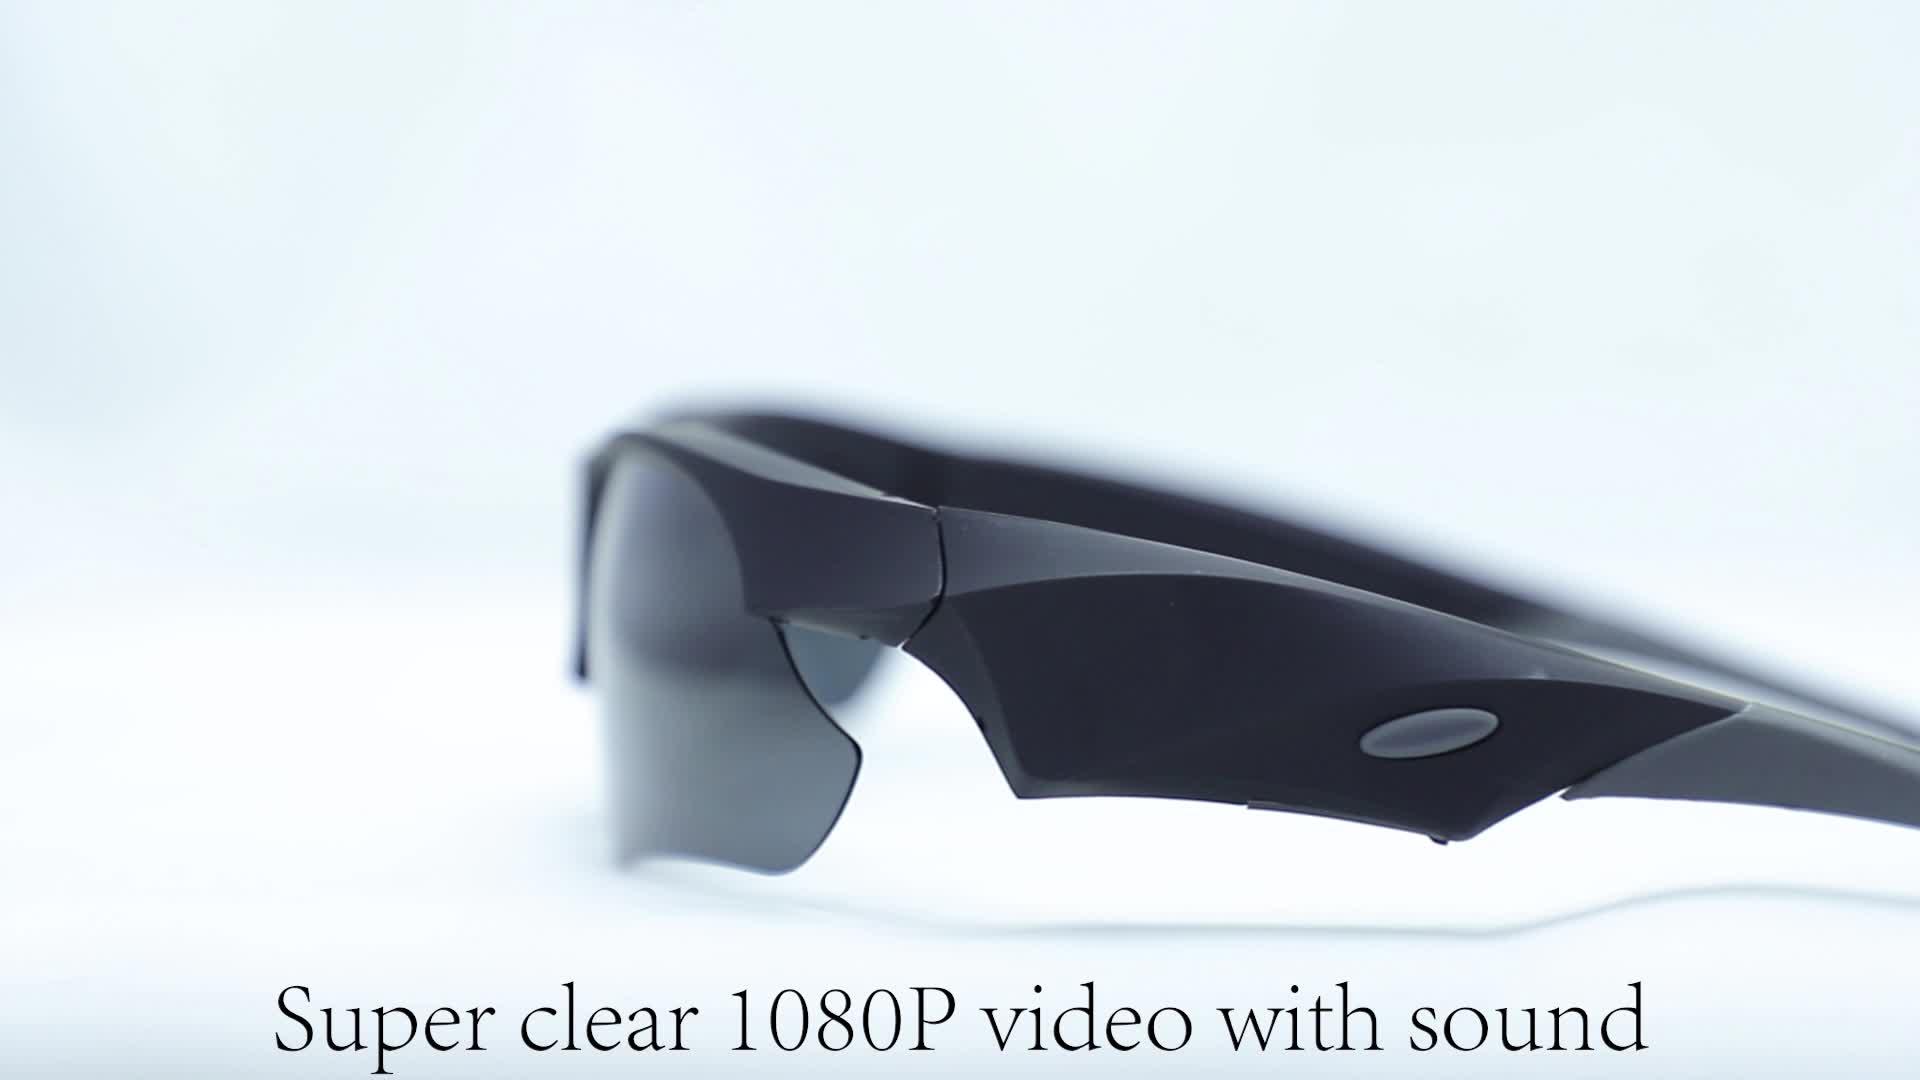 Eyeglass Polarized Lenses 1080p Recording Eyewear DVR POV Action Camcorder Record Audio and Video sg110 Record Sunglasses Camera